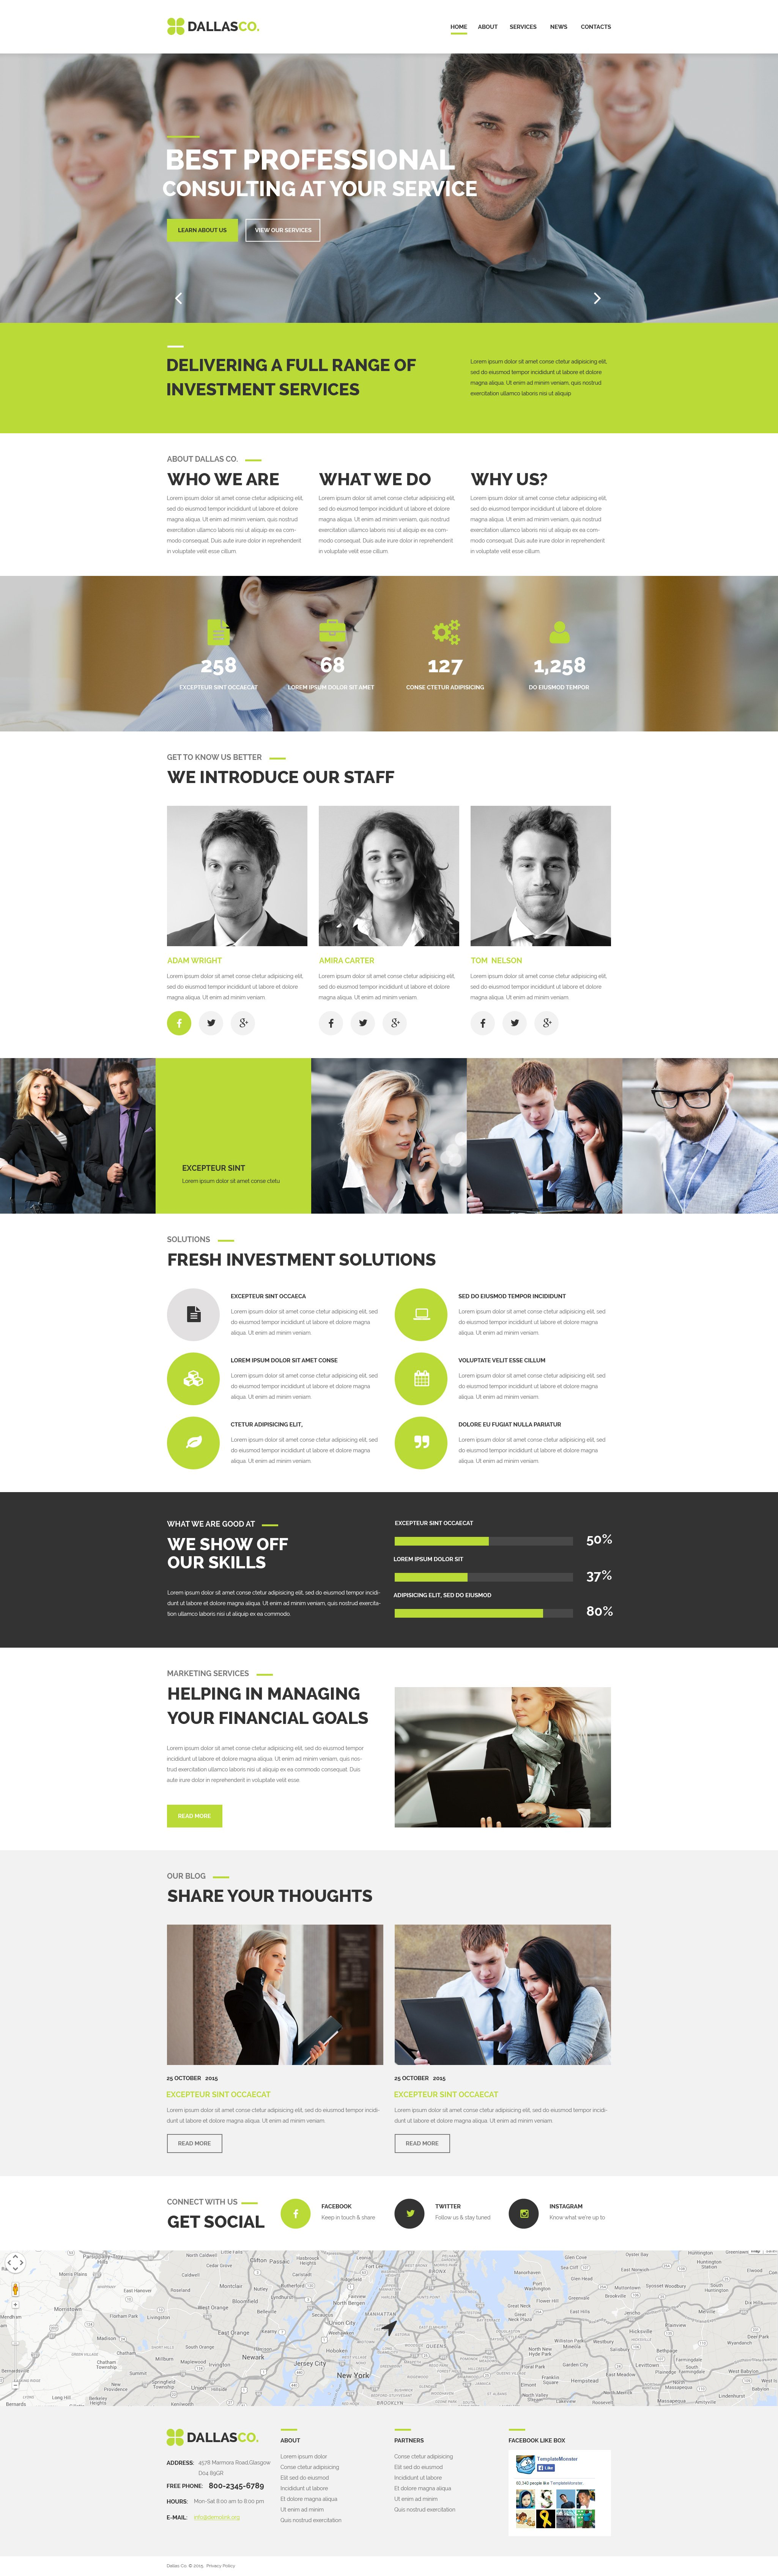 """Business Center"" - PSD шаблон №55897 - скріншот"